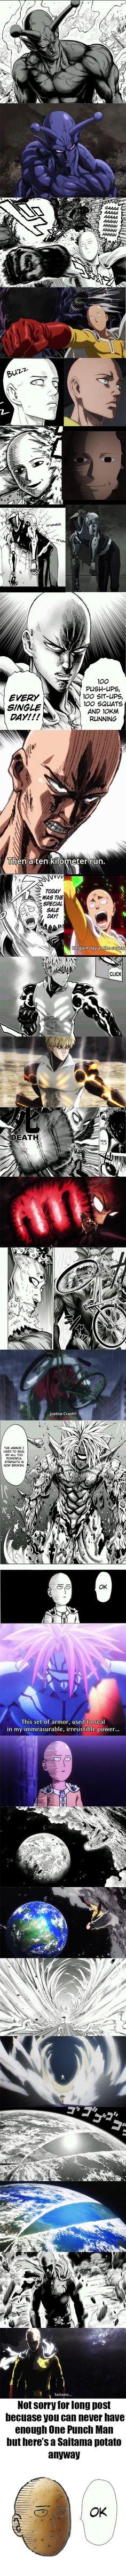 A One Punch Man comparison: Manga vs Anime